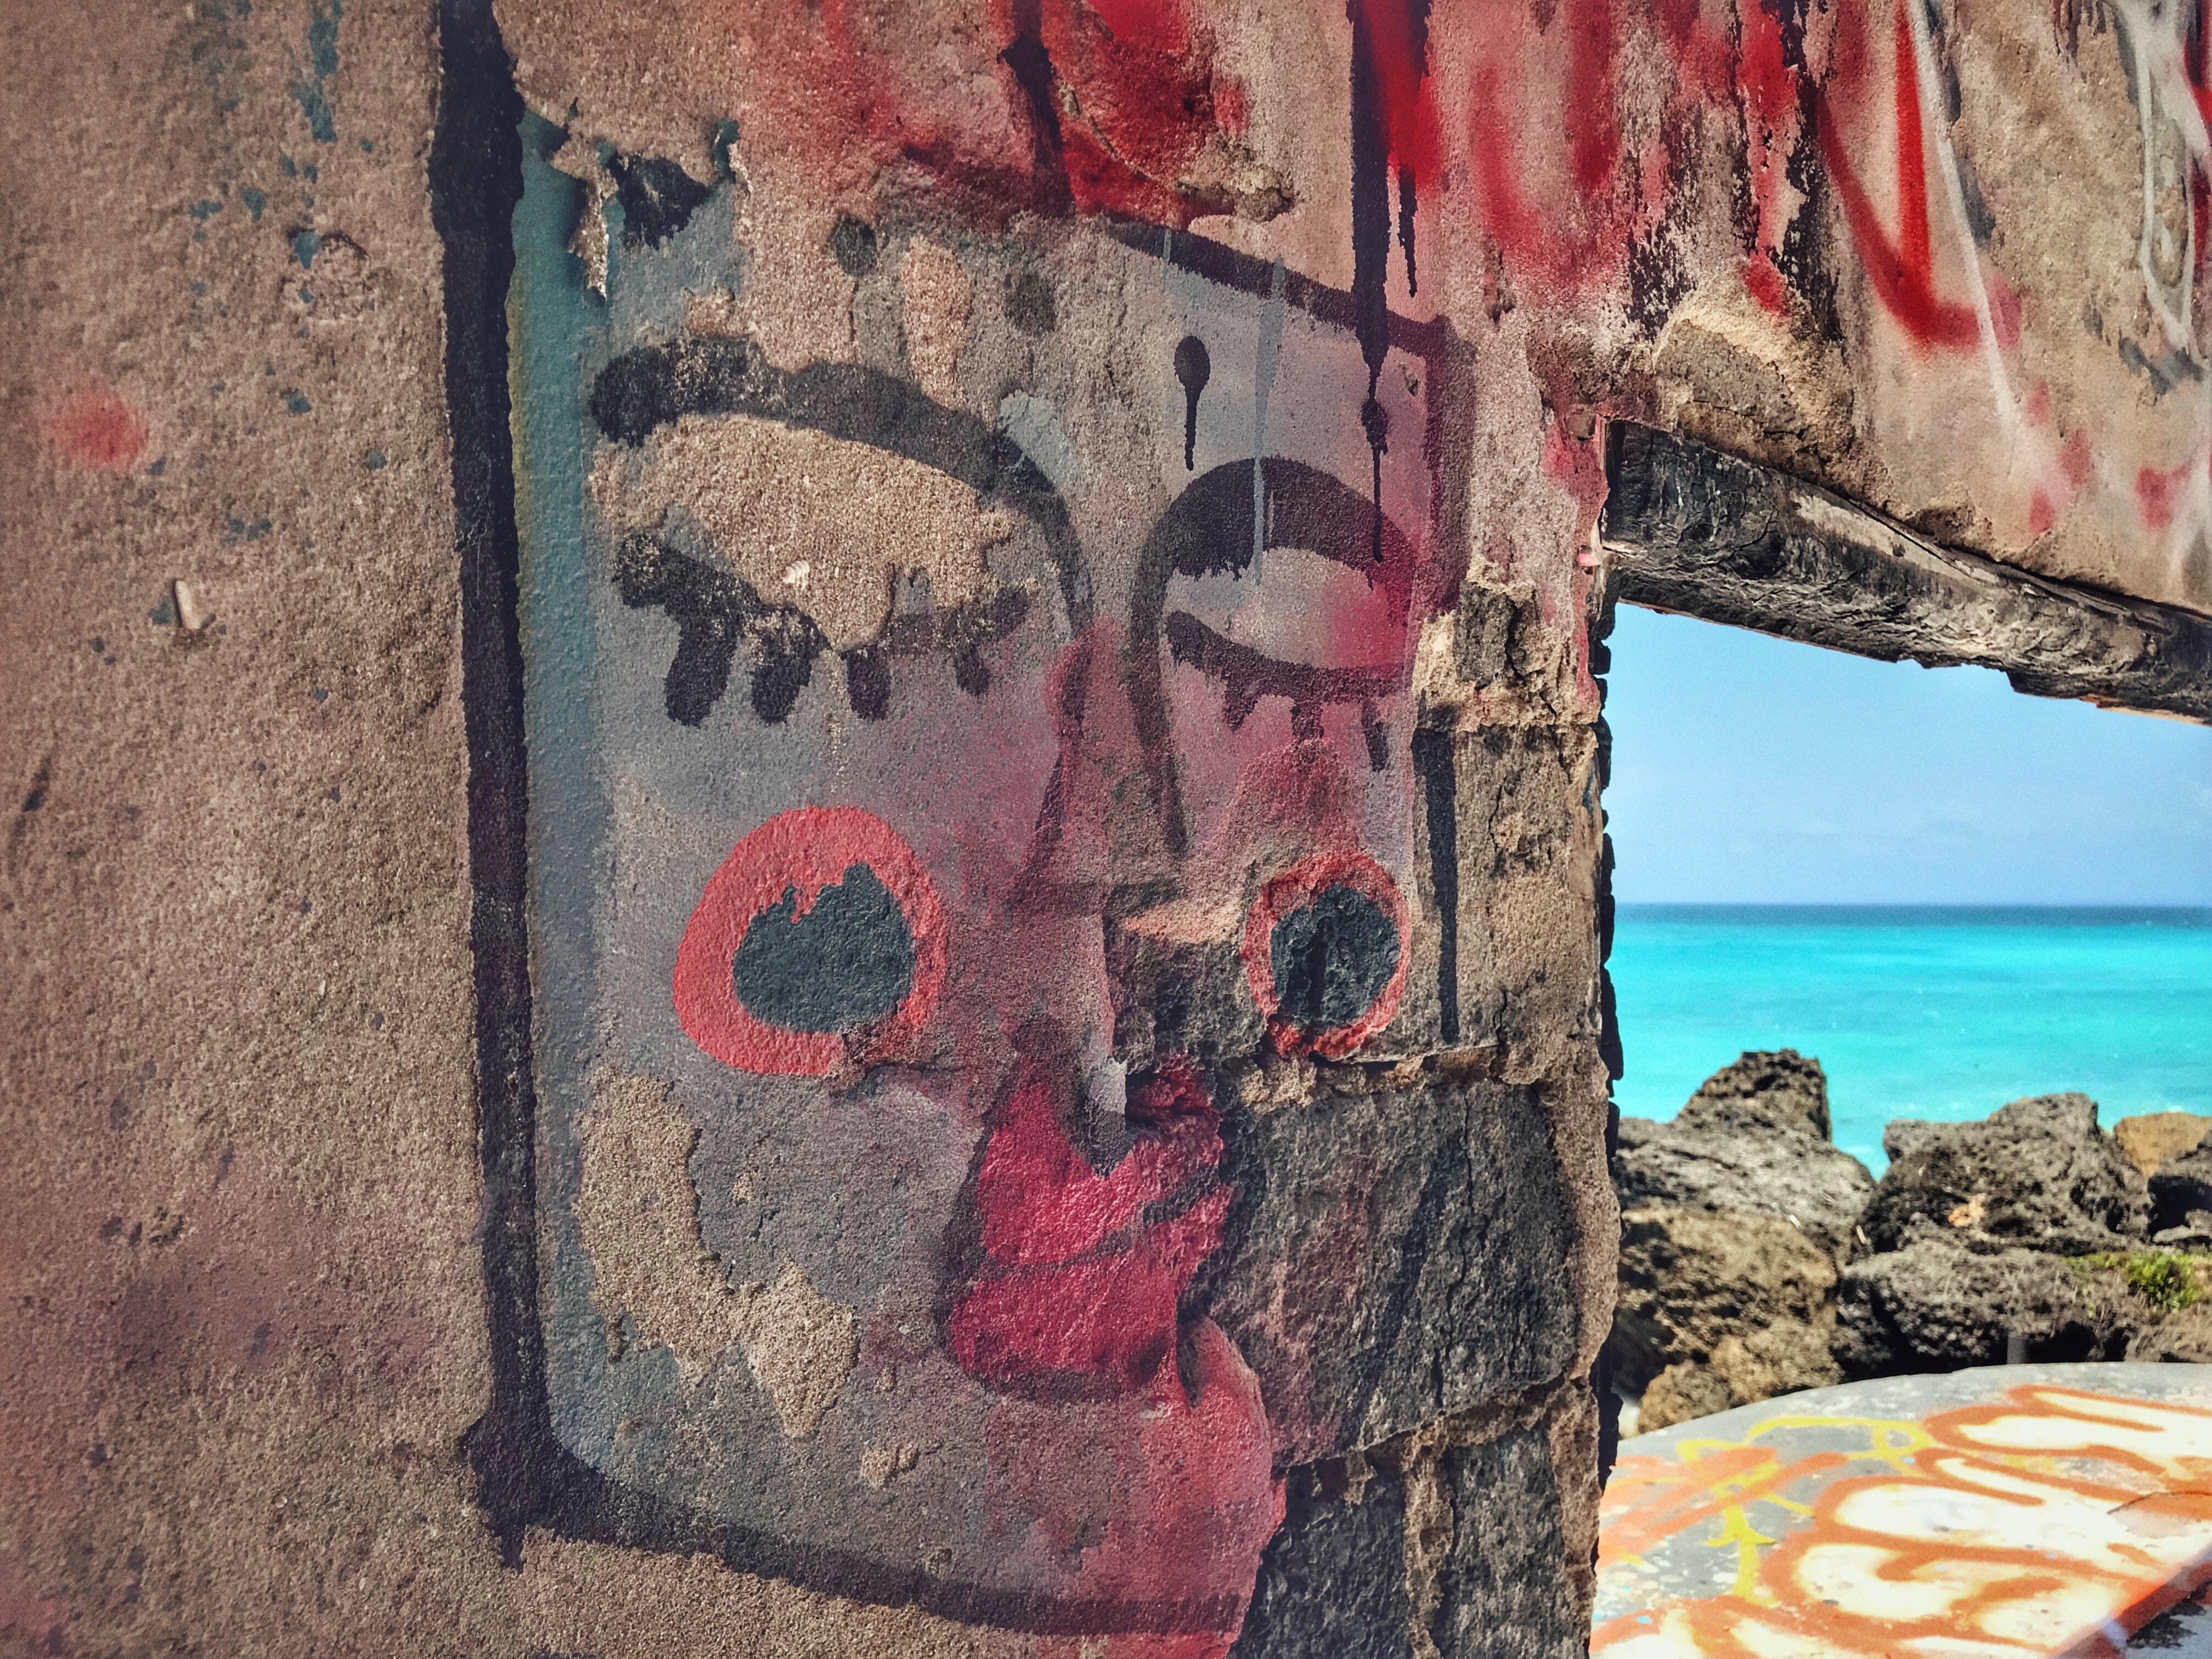 graffiti near body of water